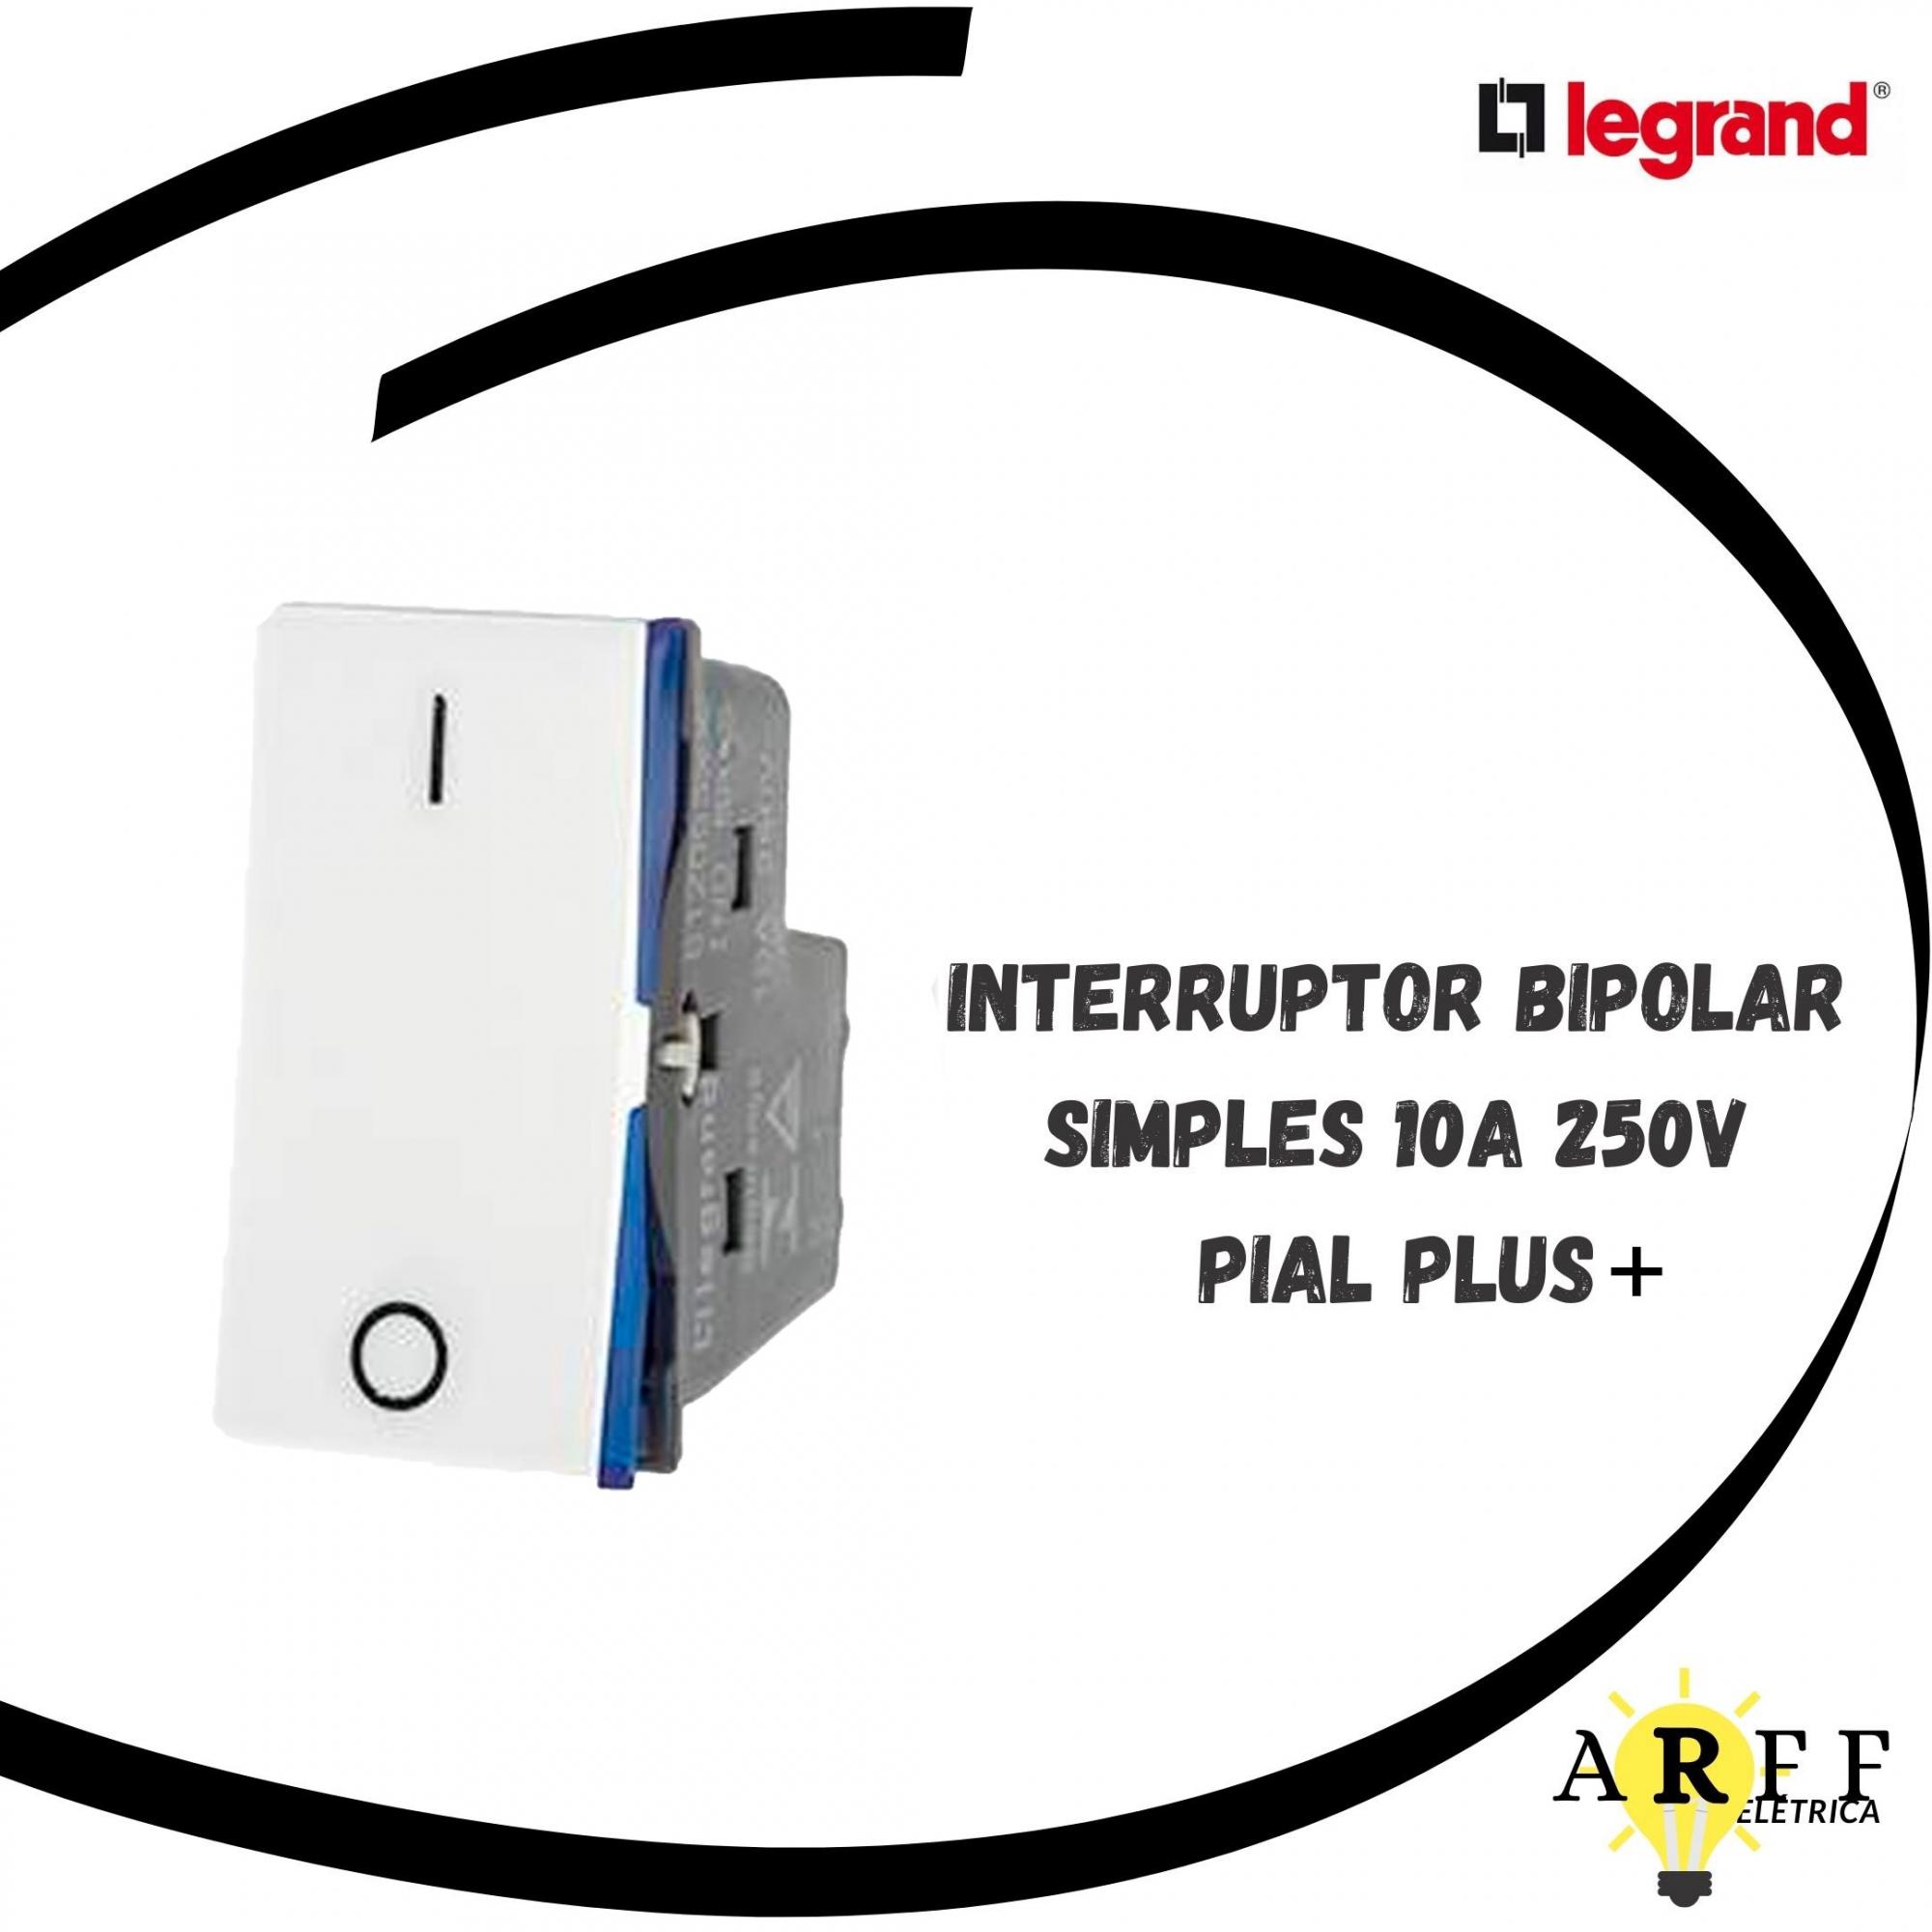 612005BC Interruptor Bipolar Simples Módulo 10A/250V - PIAL PLUS+ LEGRAND